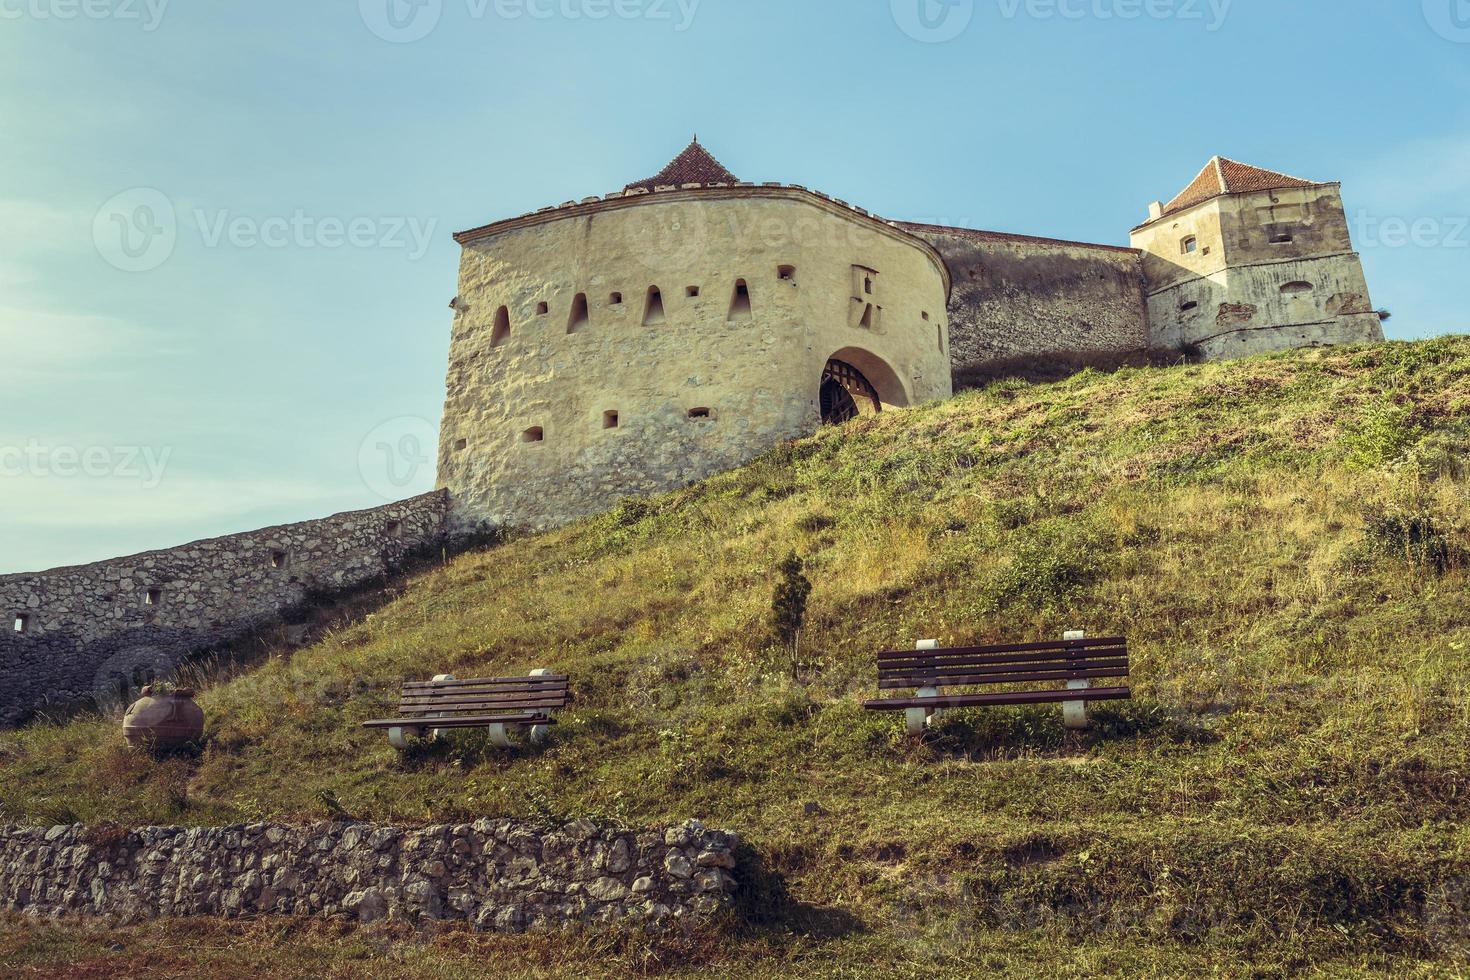 Rasnov mittelalterliche Zitadelle, Rumänien foto